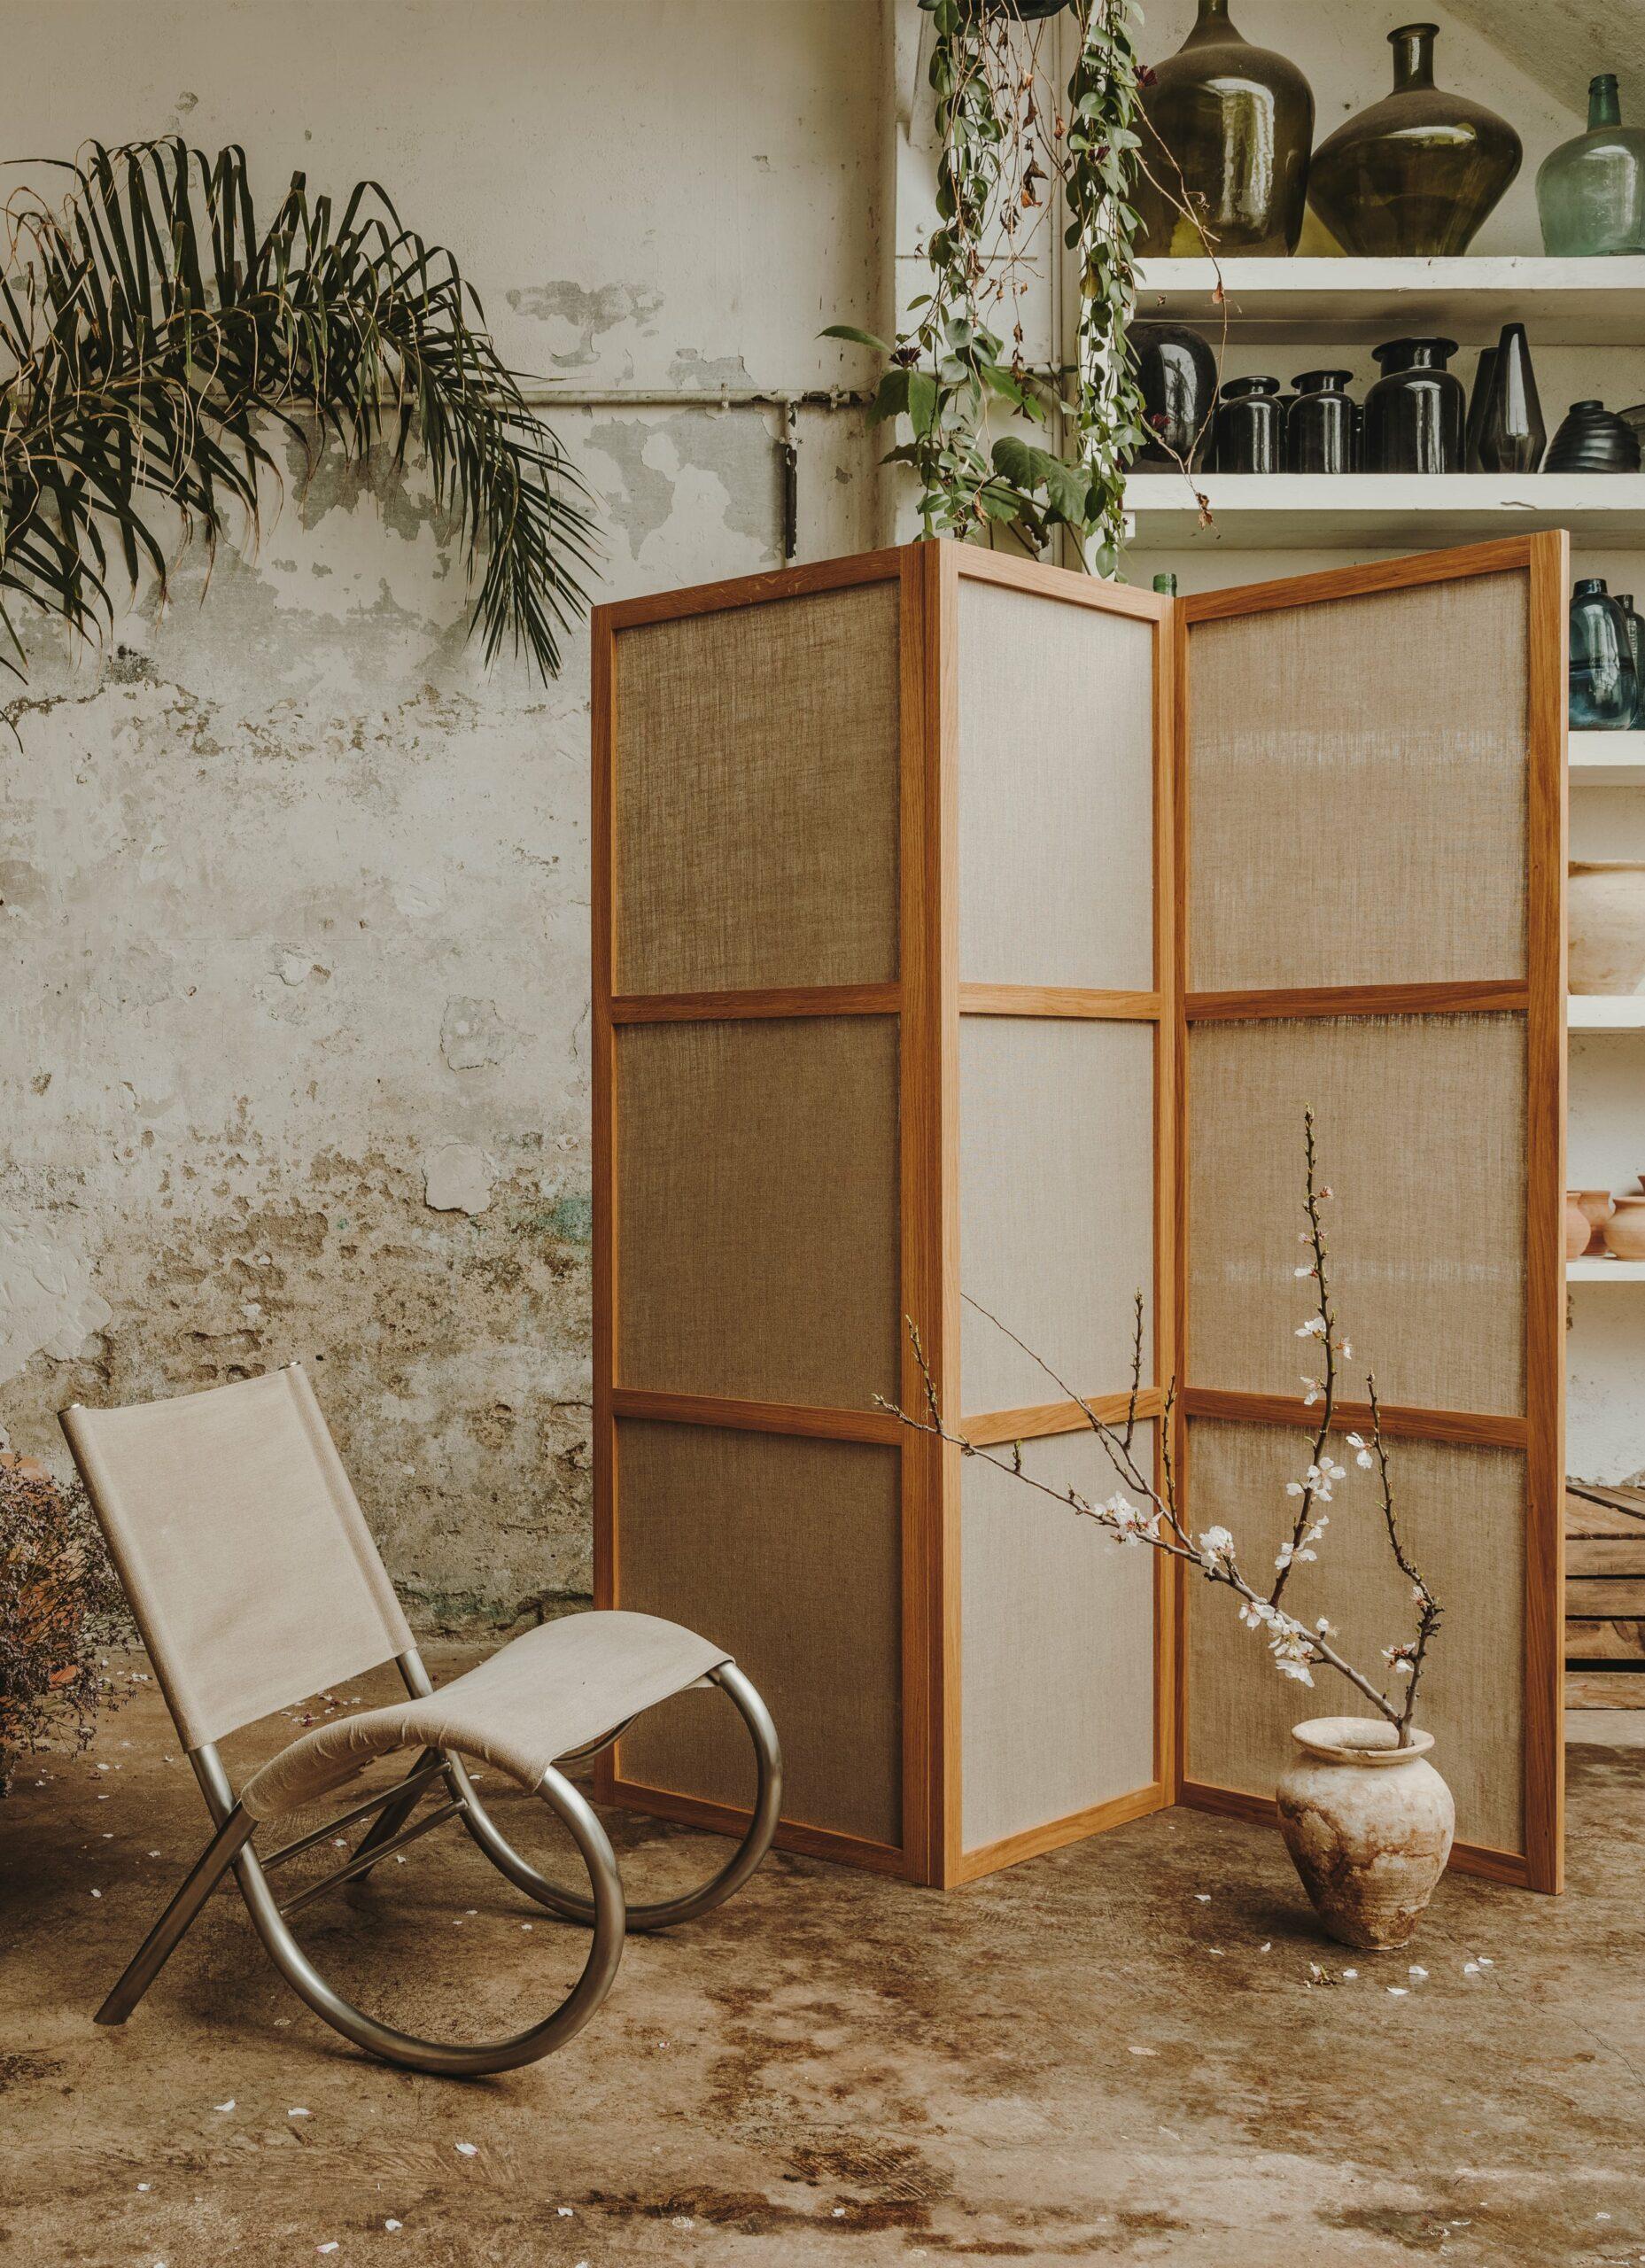 volta_voltavienna-concept-store-vienna-home-goods-interior-design-frama-apartamento-kinfolk-openhouse-minimalist-simple-living